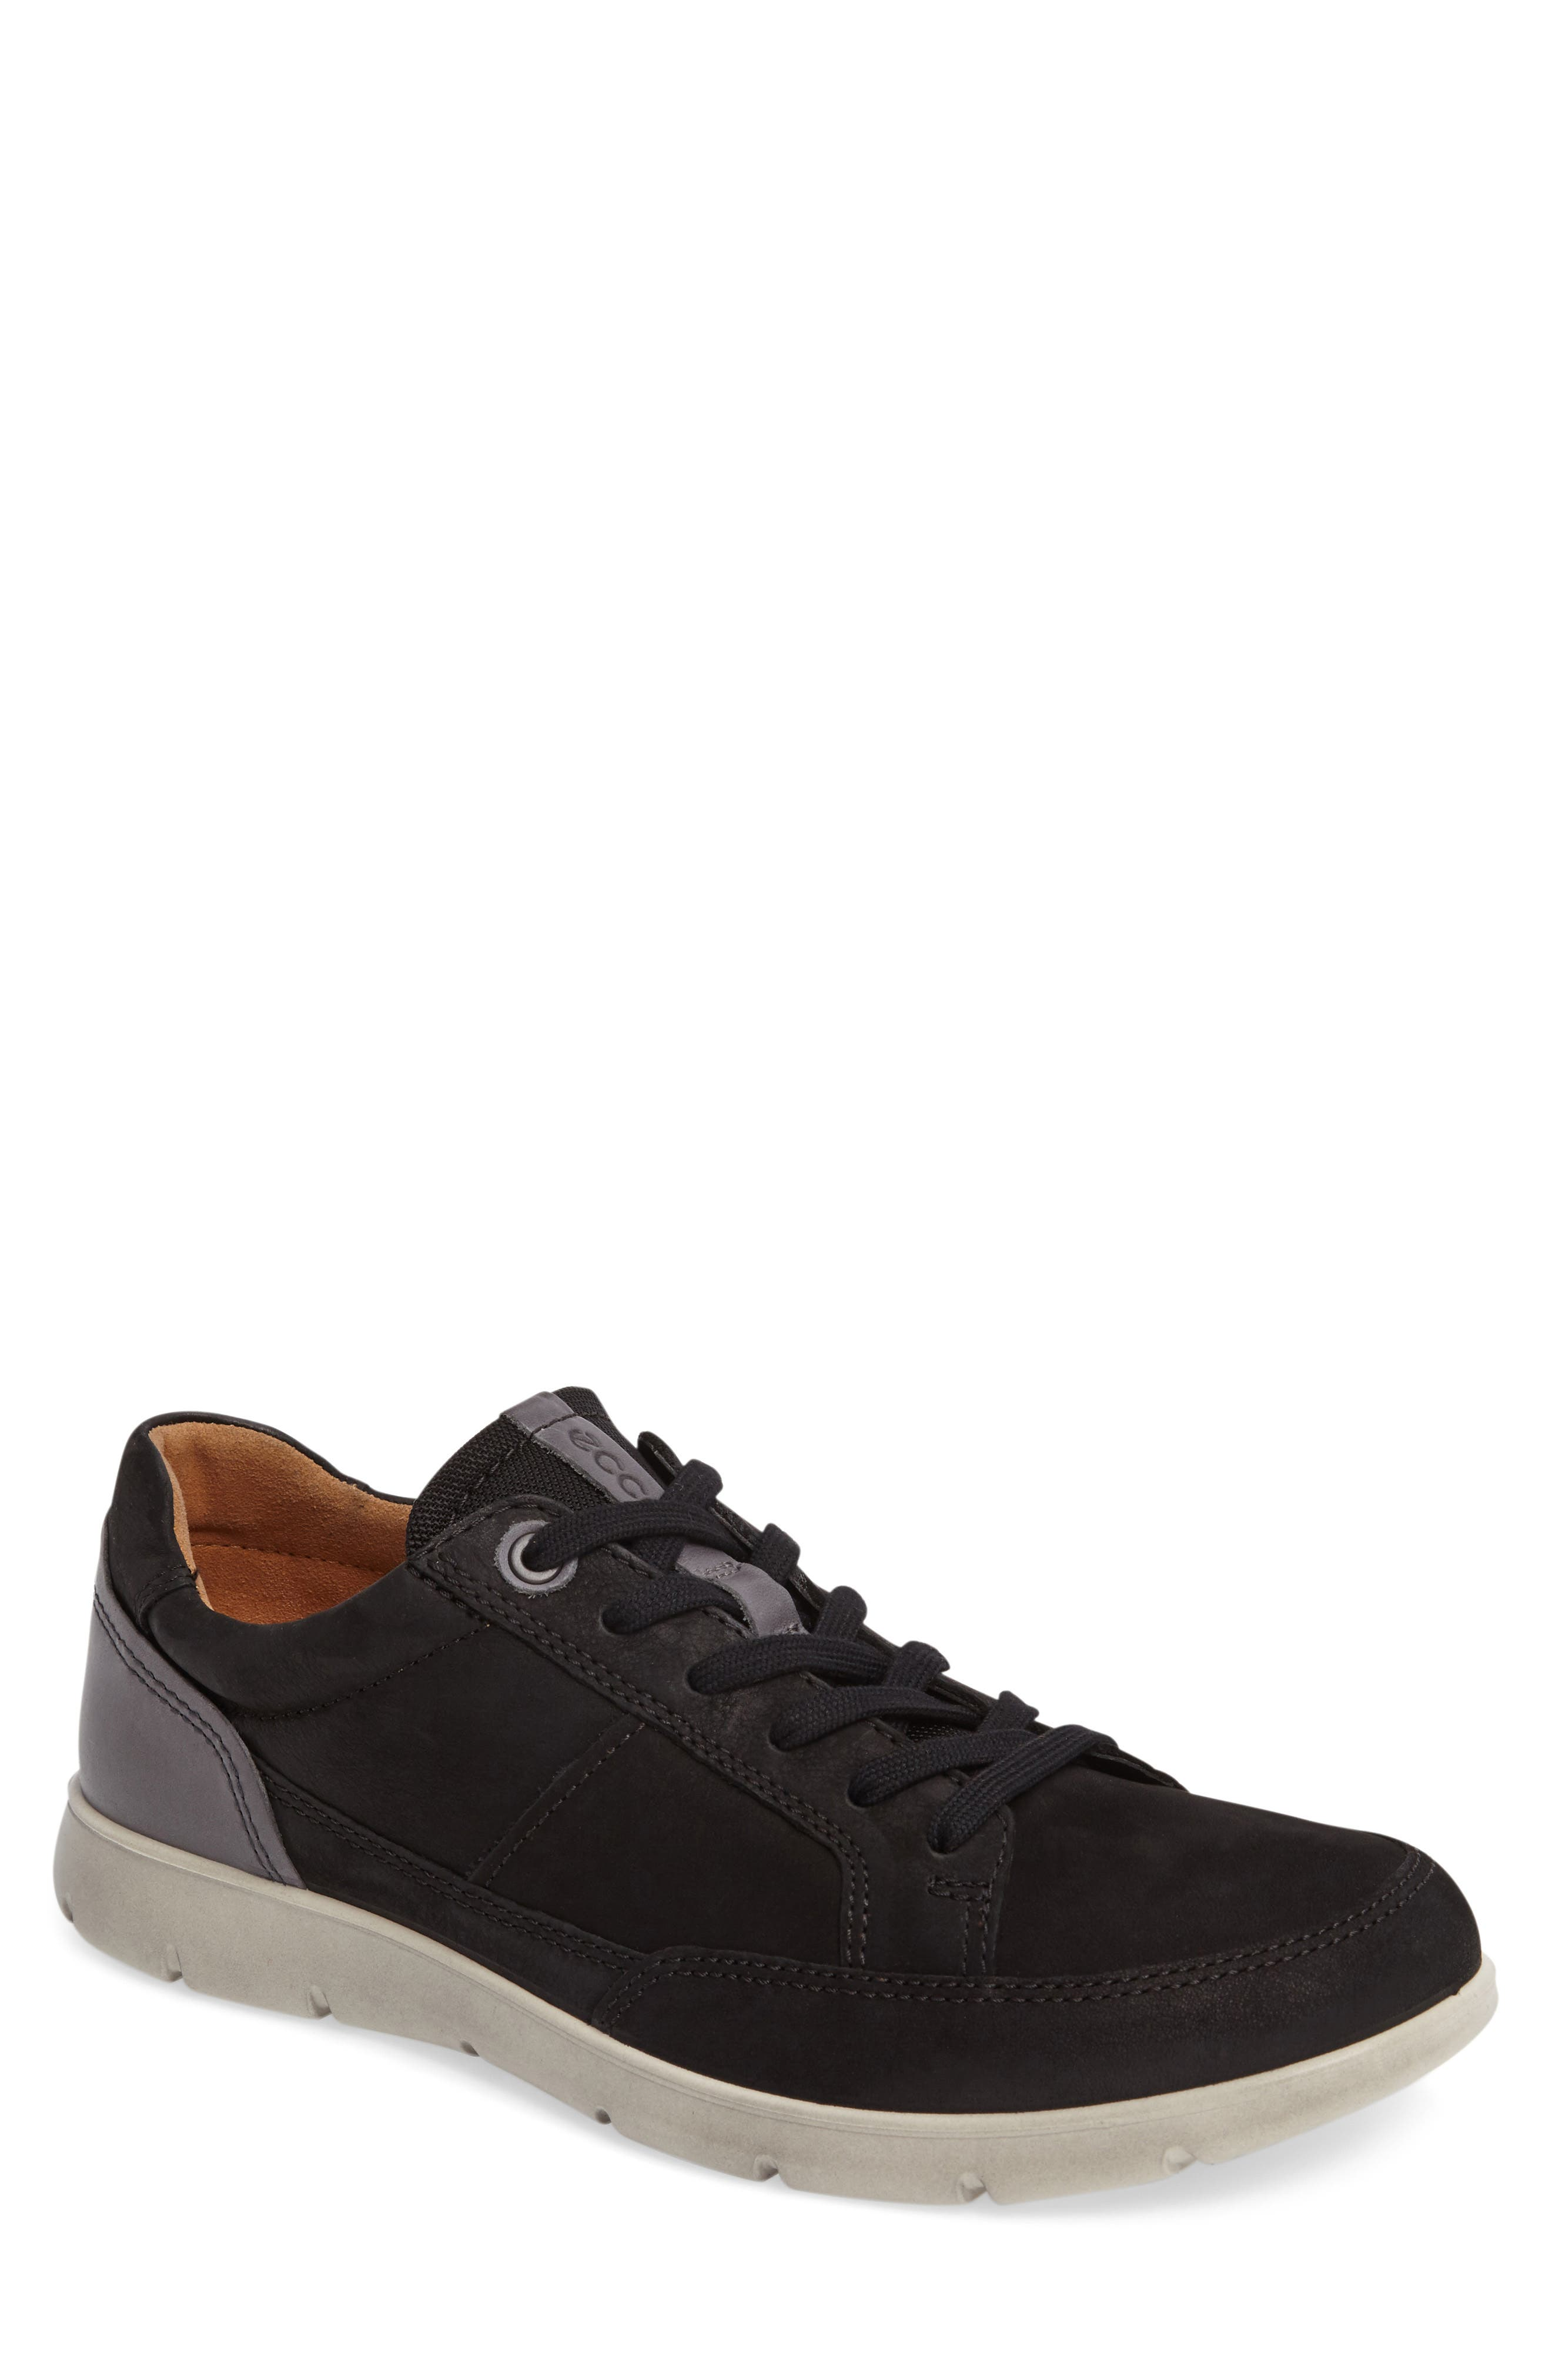 Iowa Neo Sneaker,                             Main thumbnail 1, color,